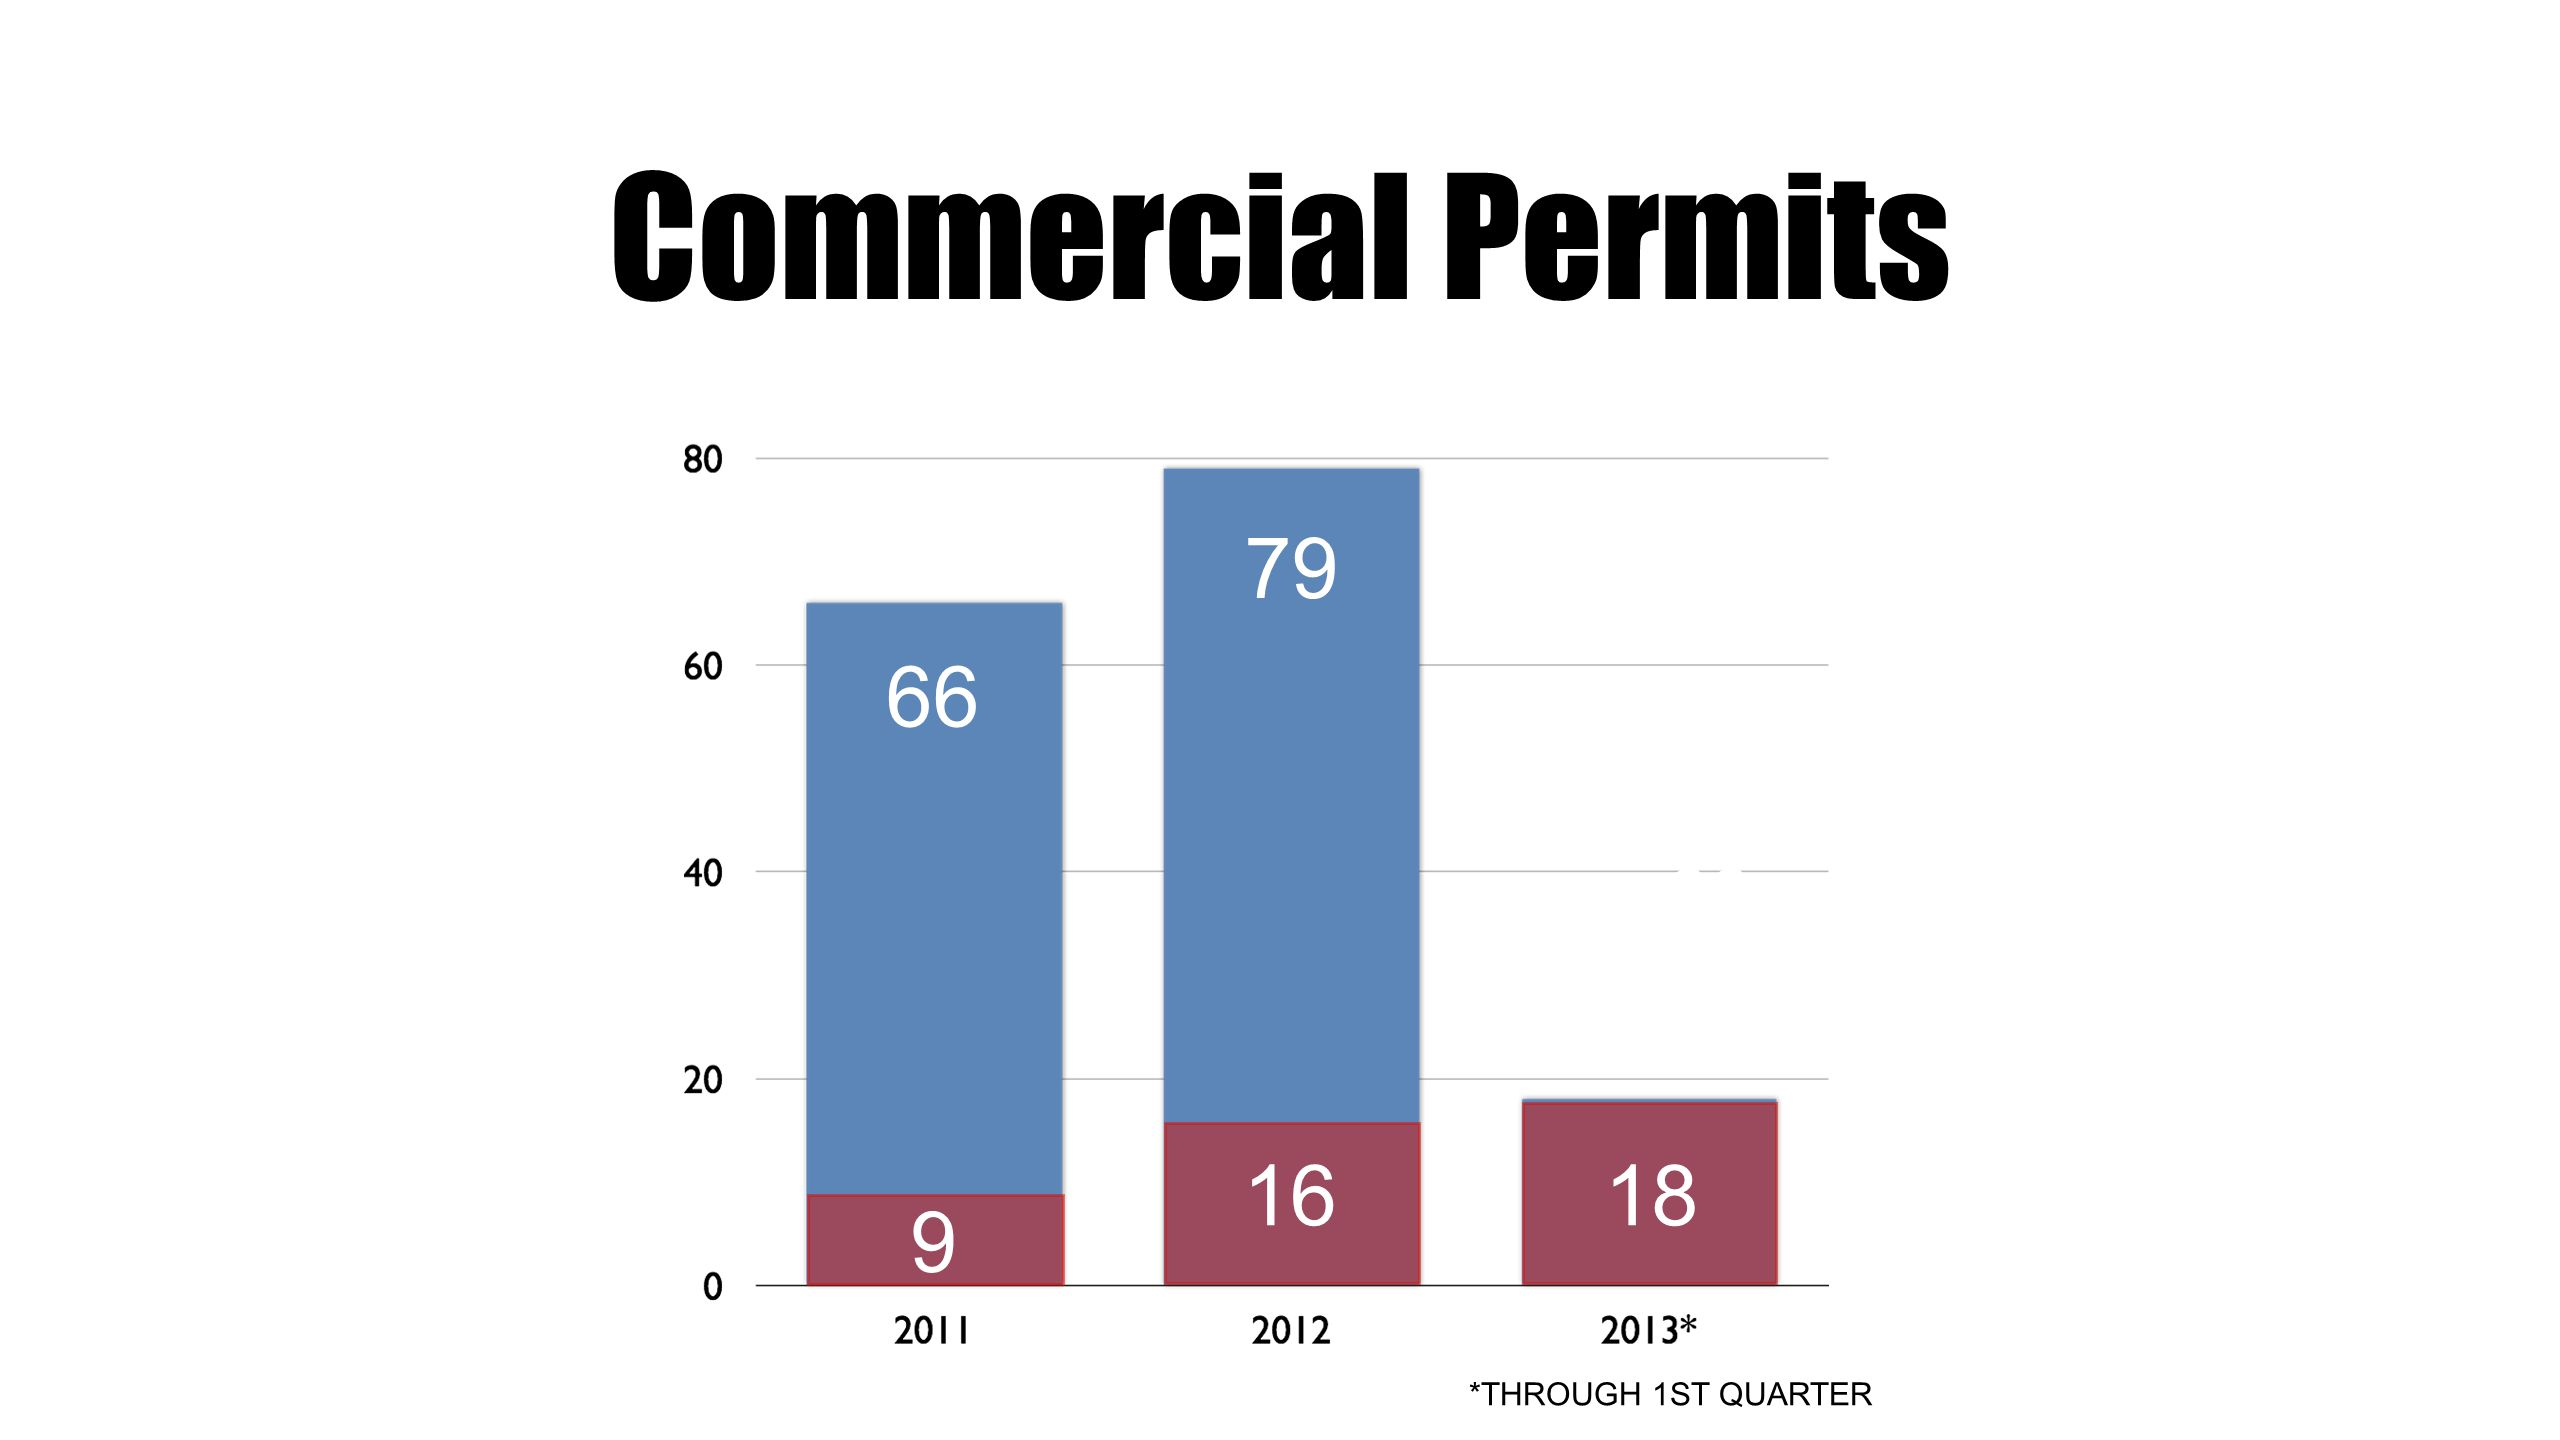 Commercial Permits 56 6679 *THROUGH 1ST QUARTER $11,187,595 9 1618 79 66